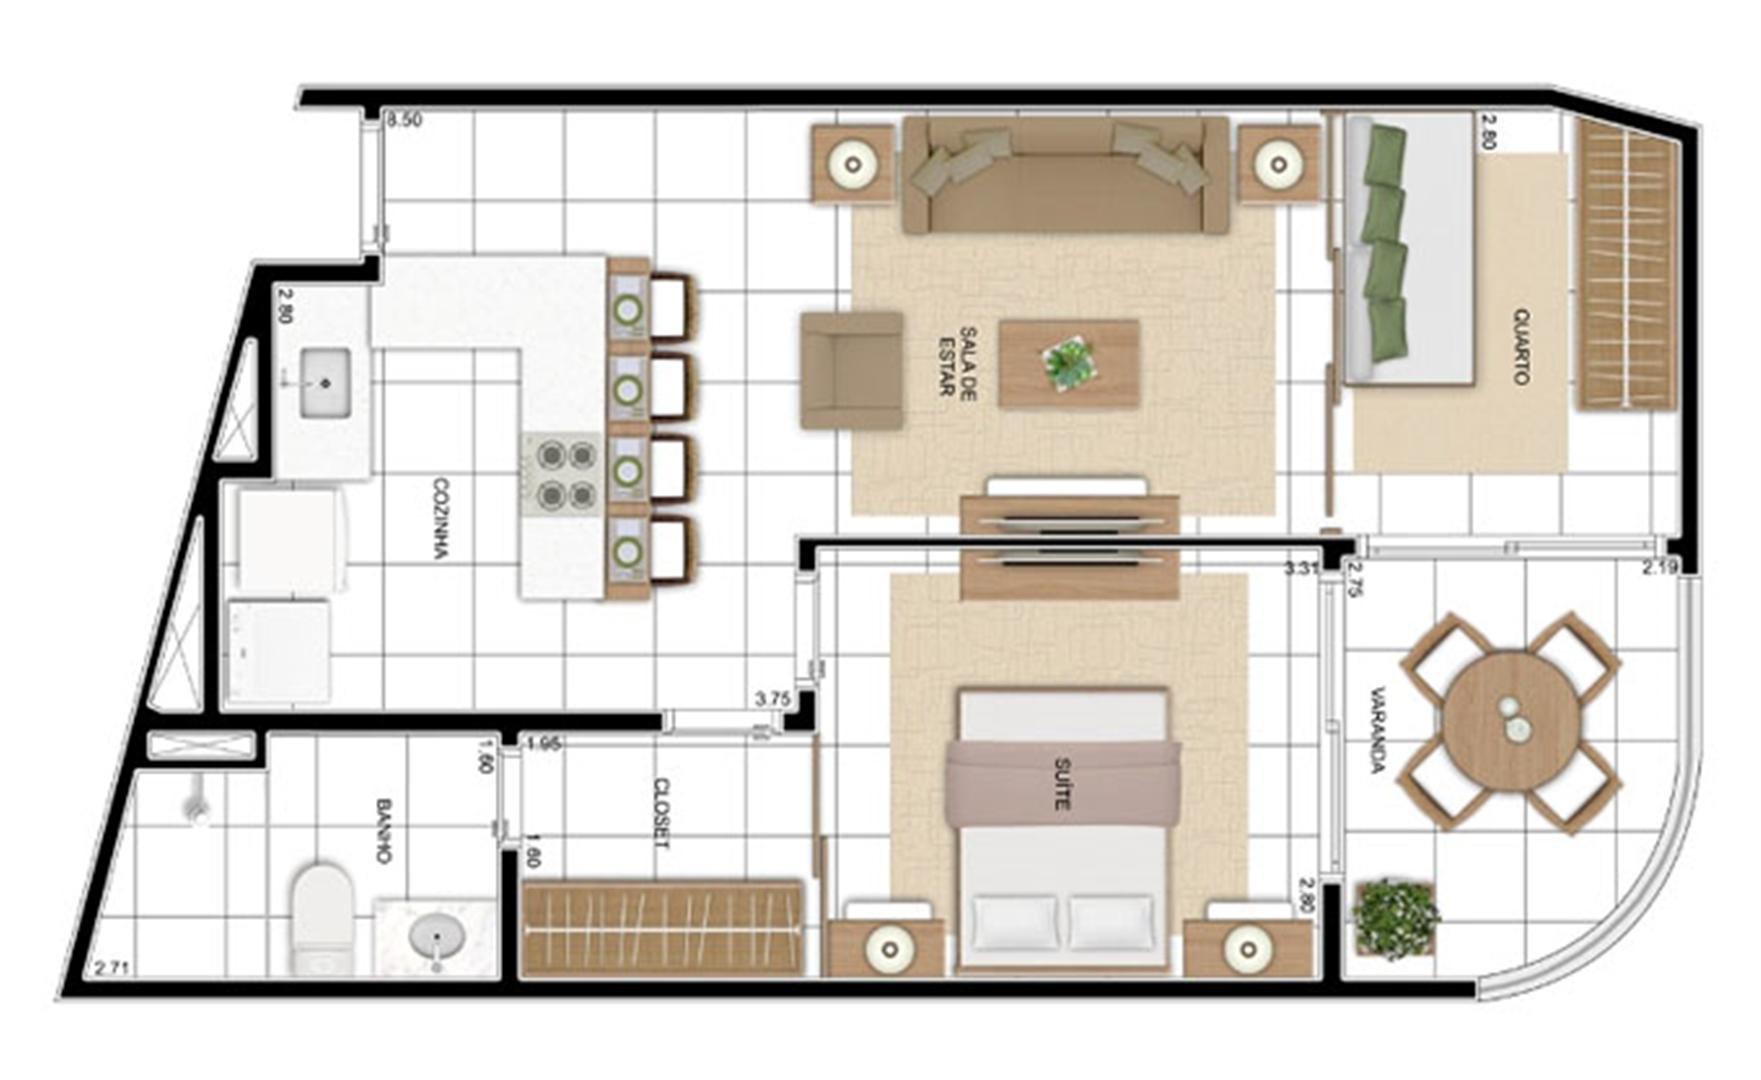 PLANTA - APTO TIPO OPÇÃO C3 - 56 m²  | In Mare Bali – Apartamento no  Distrito Litoral de Cotovelo - Parnamirim - Rio Grande do Norte